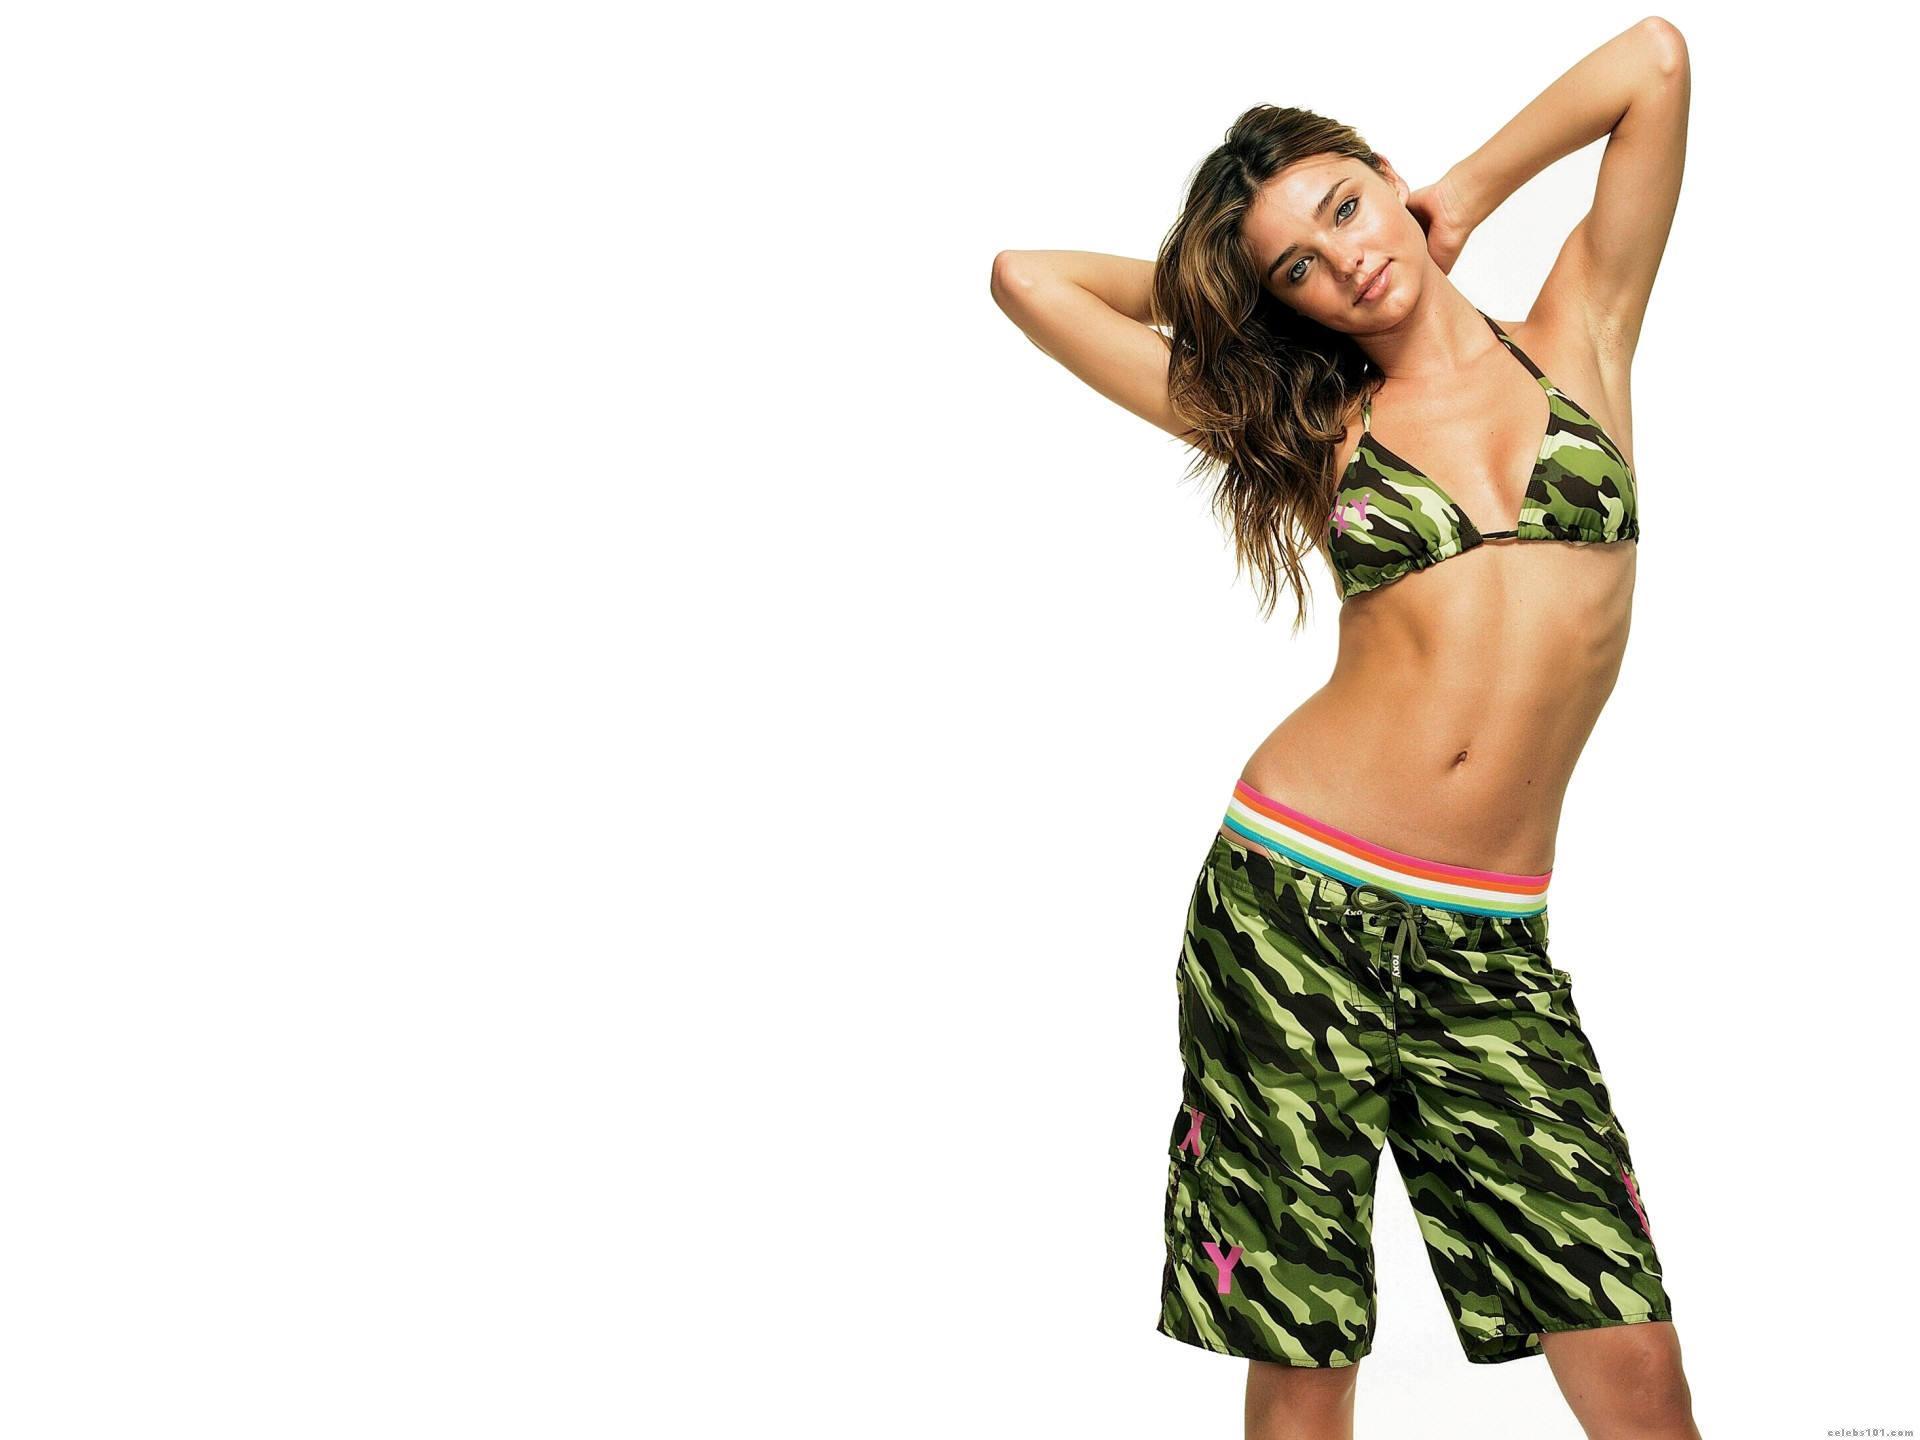 1920x1440 Miranda Kerr sexy girls bikini teen wallpaper